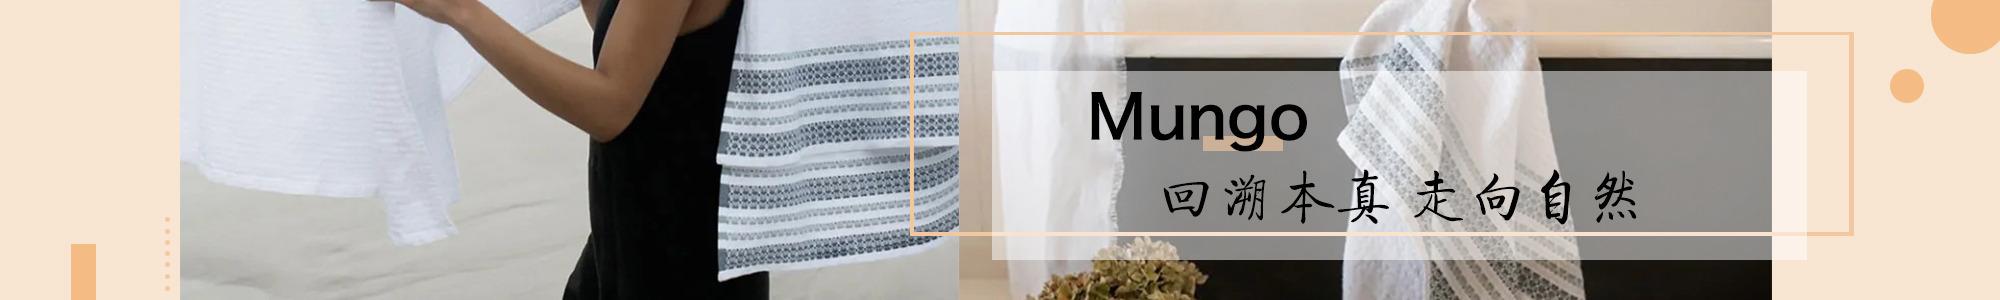 Mungo 毛巾banner